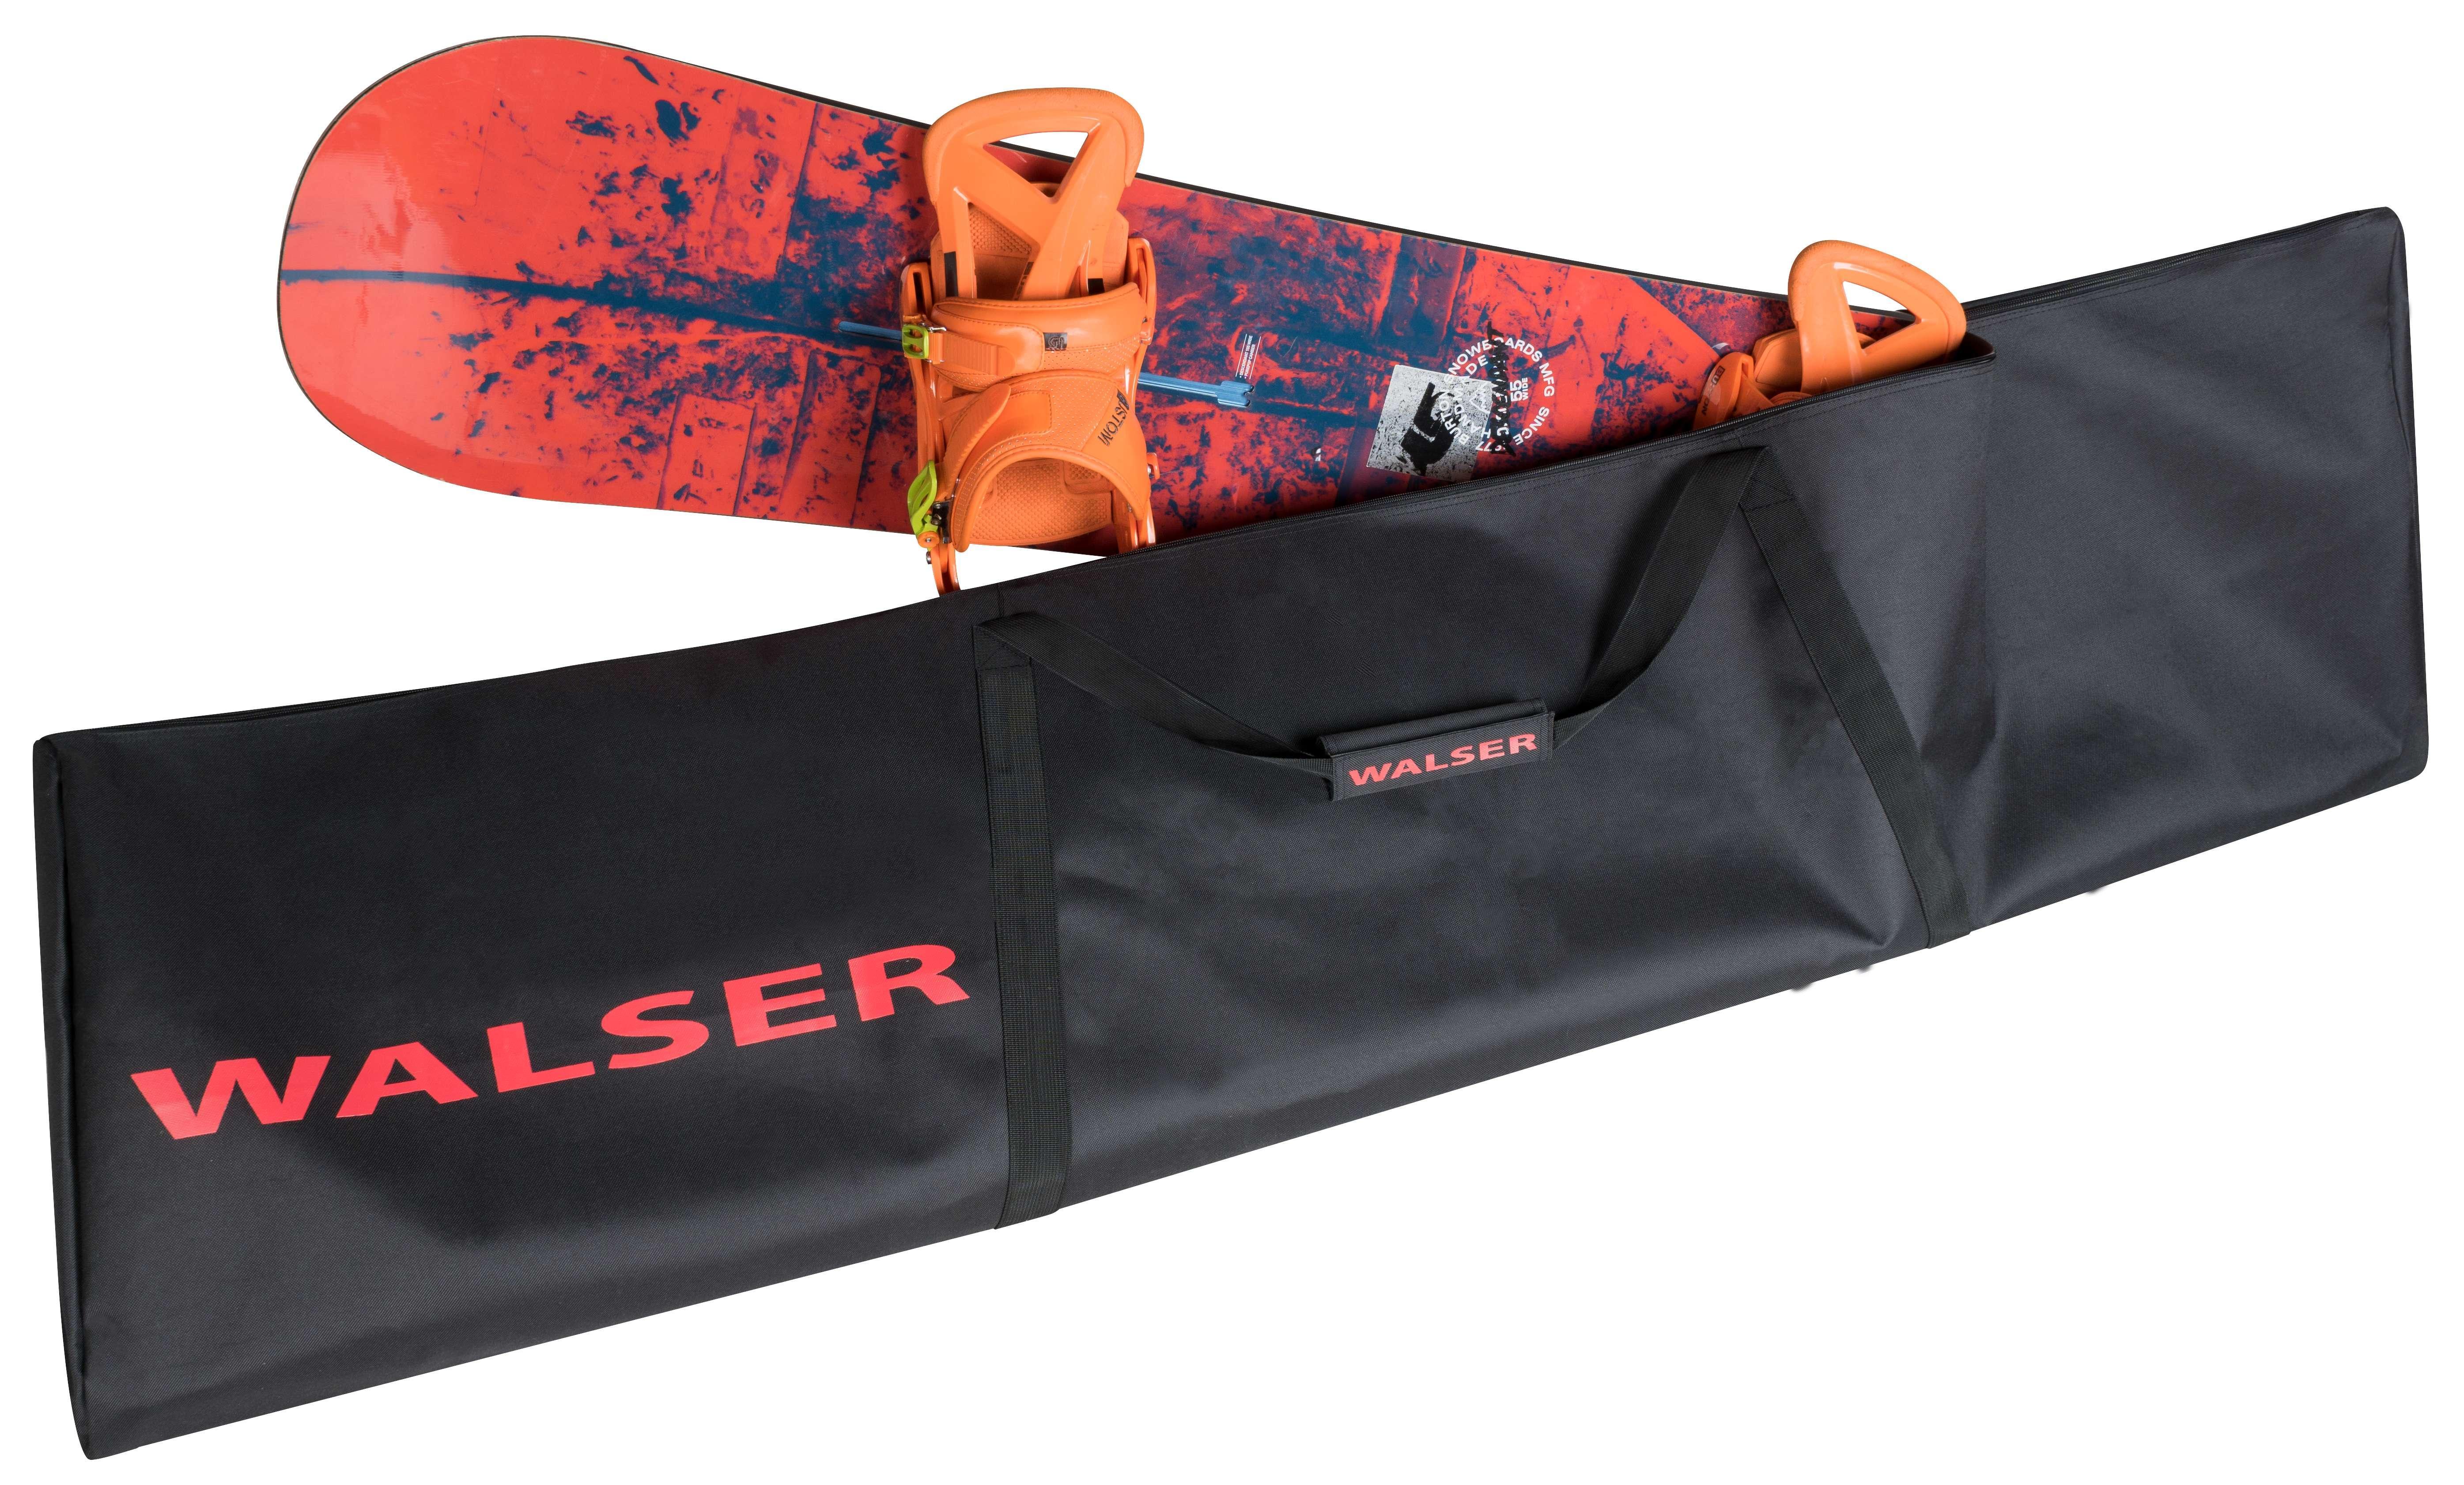 30553 Skitasche WALSER 30553 - Große Auswahl - stark reduziert